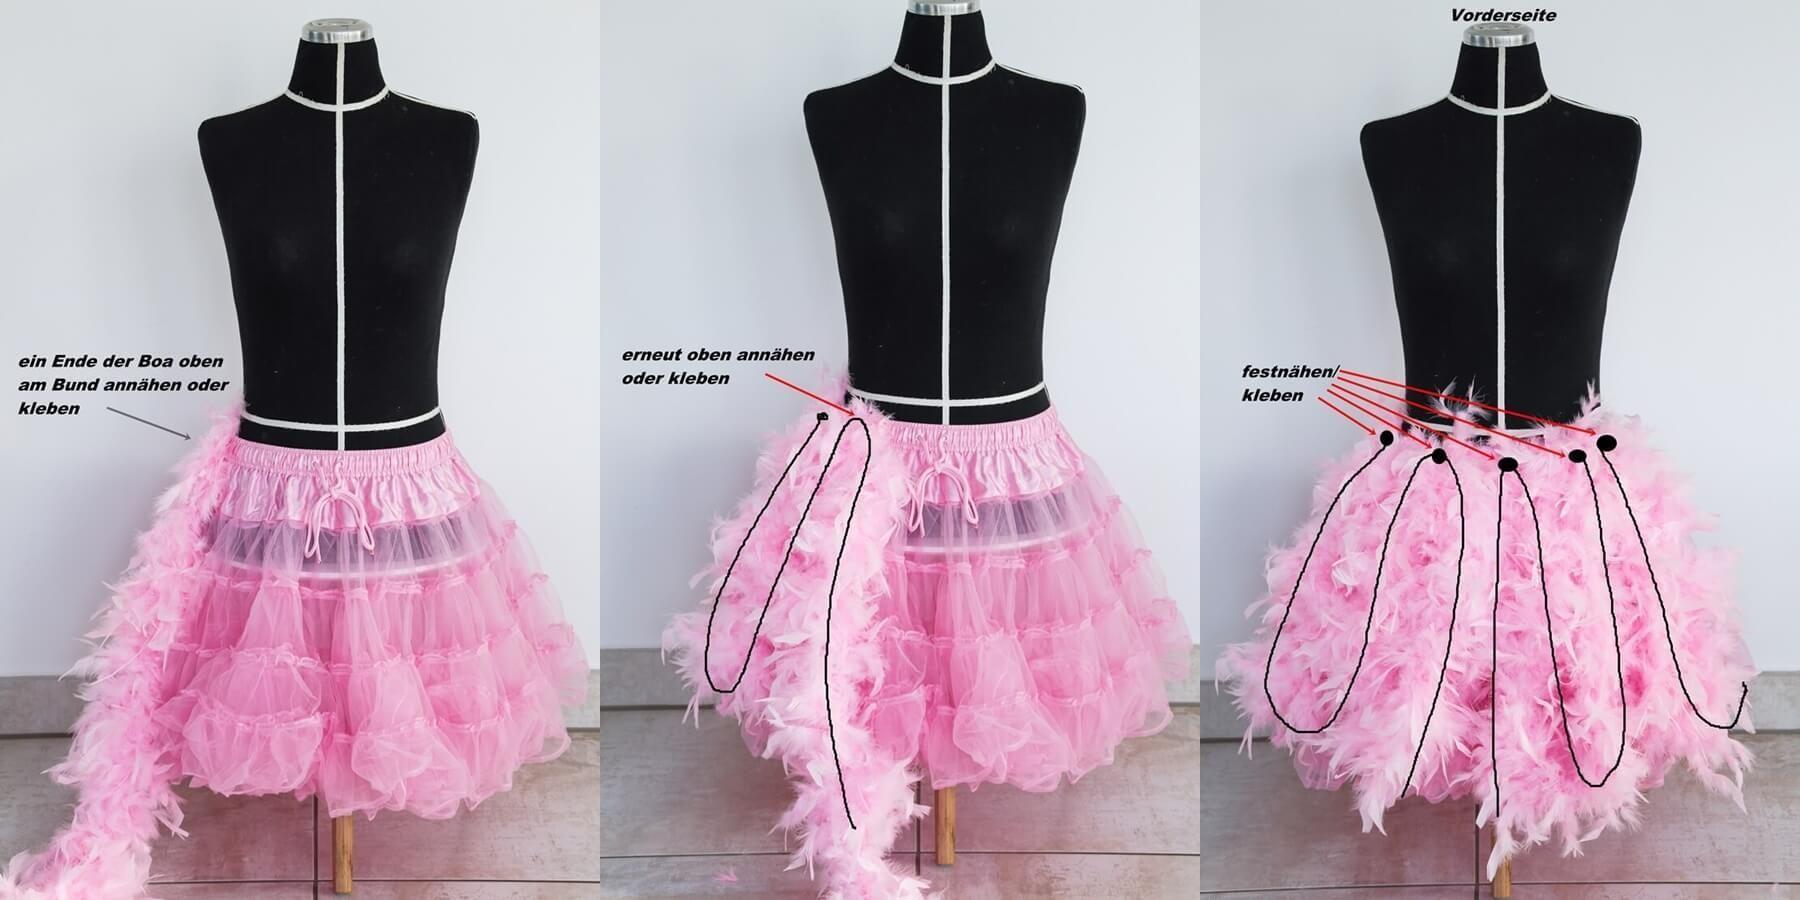 Last Minute Karnevalskostüm Flamingo - lady-stil.de #gruppenkostüme